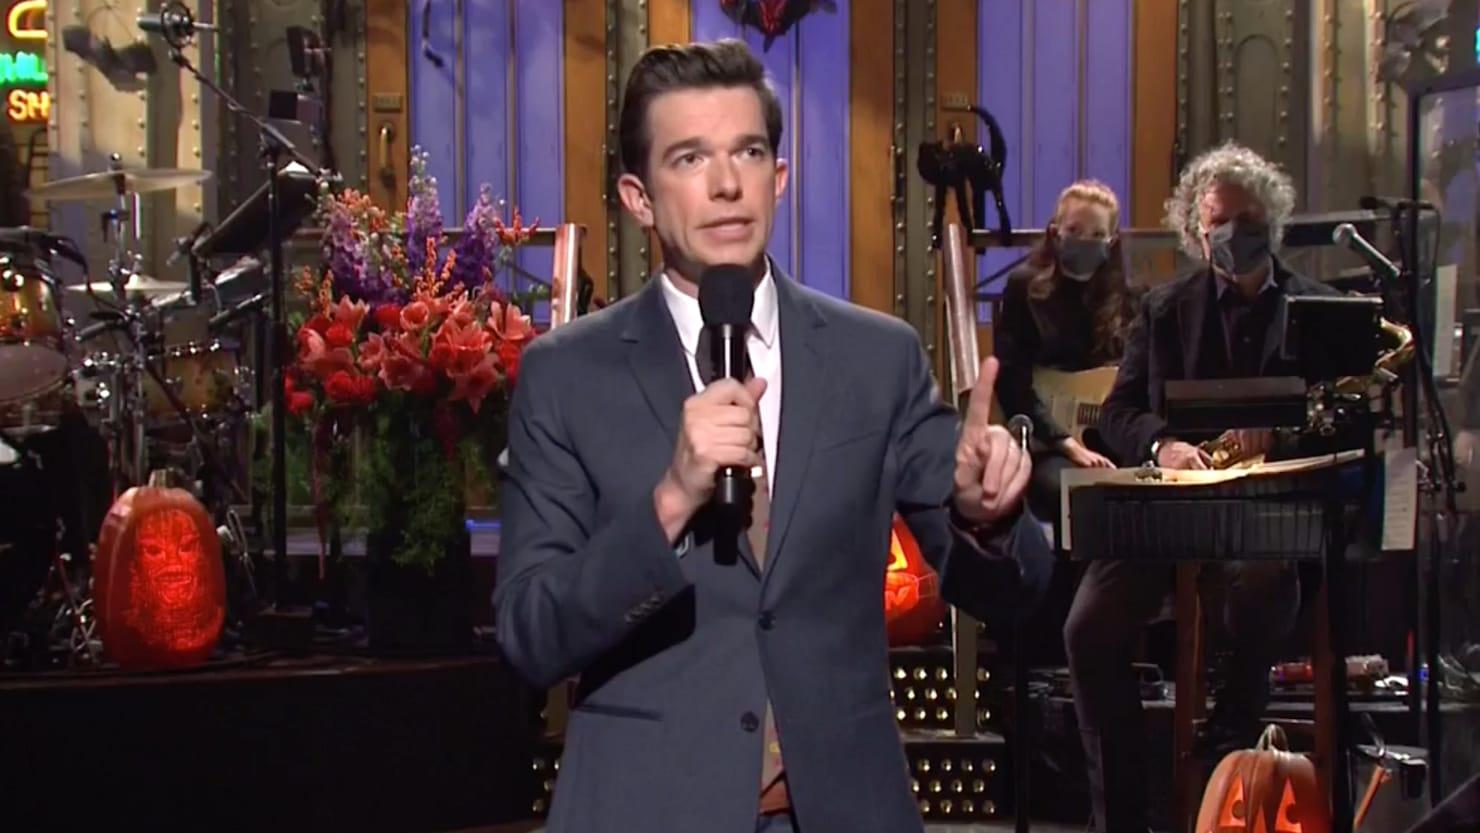 SNL Host John Mulaney: 'Nothing Will Change' if Biden Beats Trump - The Daily Beast